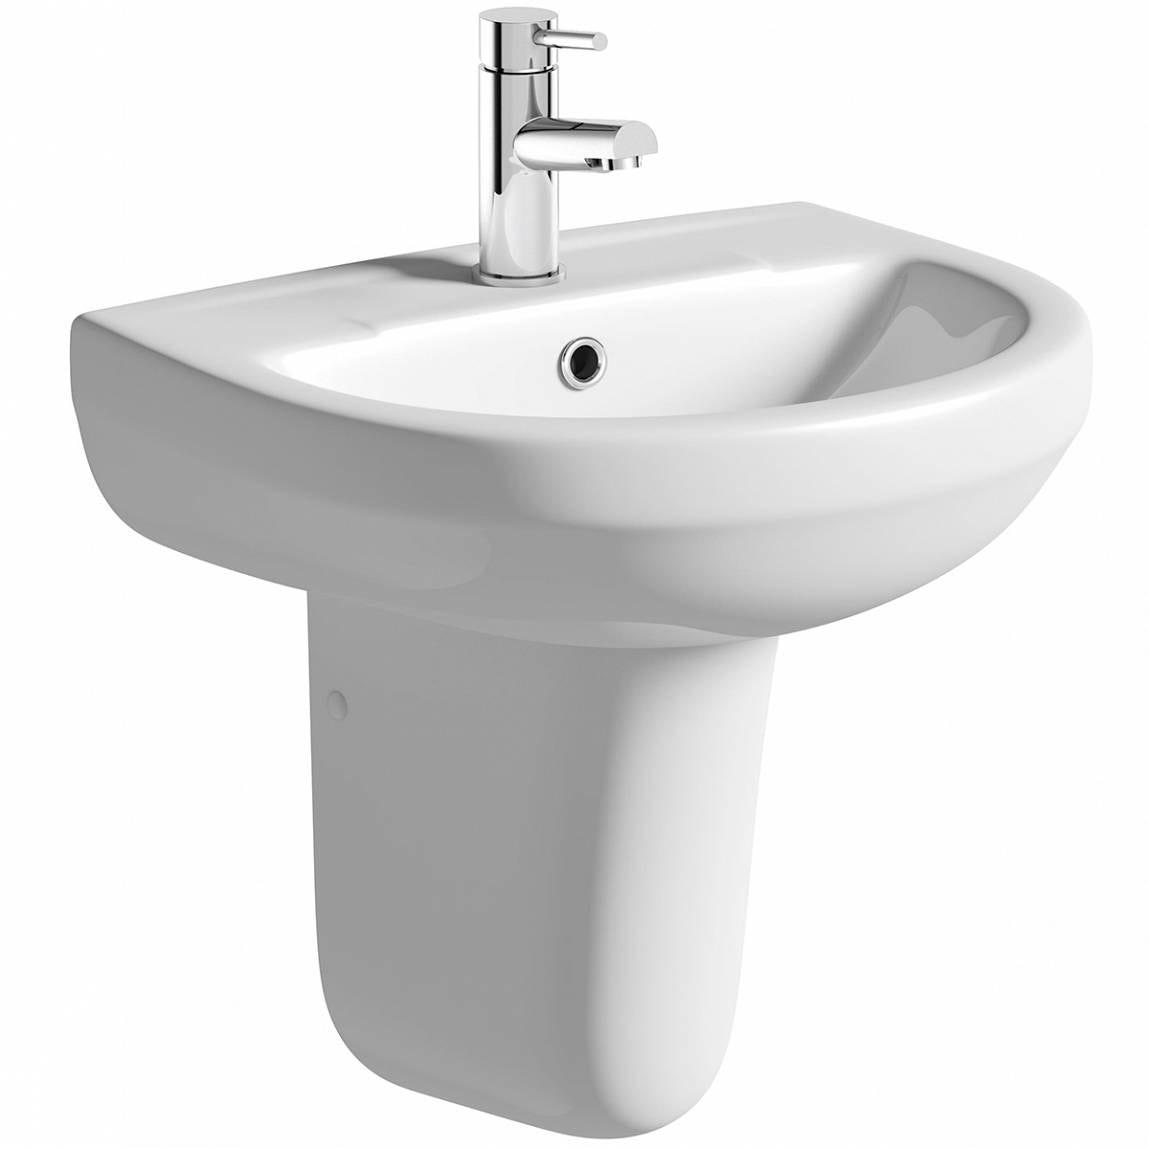 Eden 1 tap hole semi pedestal basin 550mm